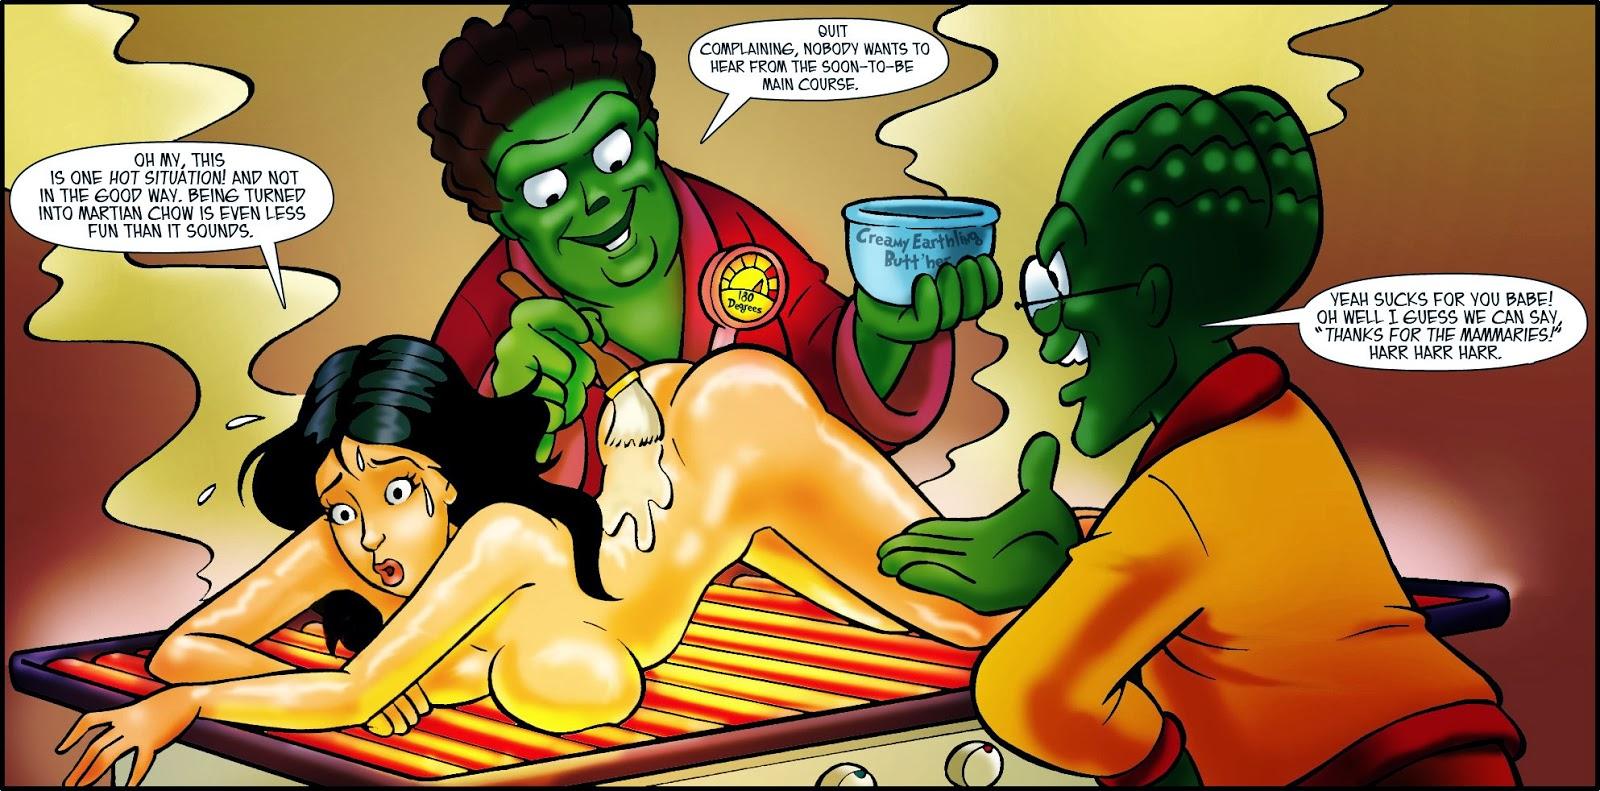 alien crave nude girl meat